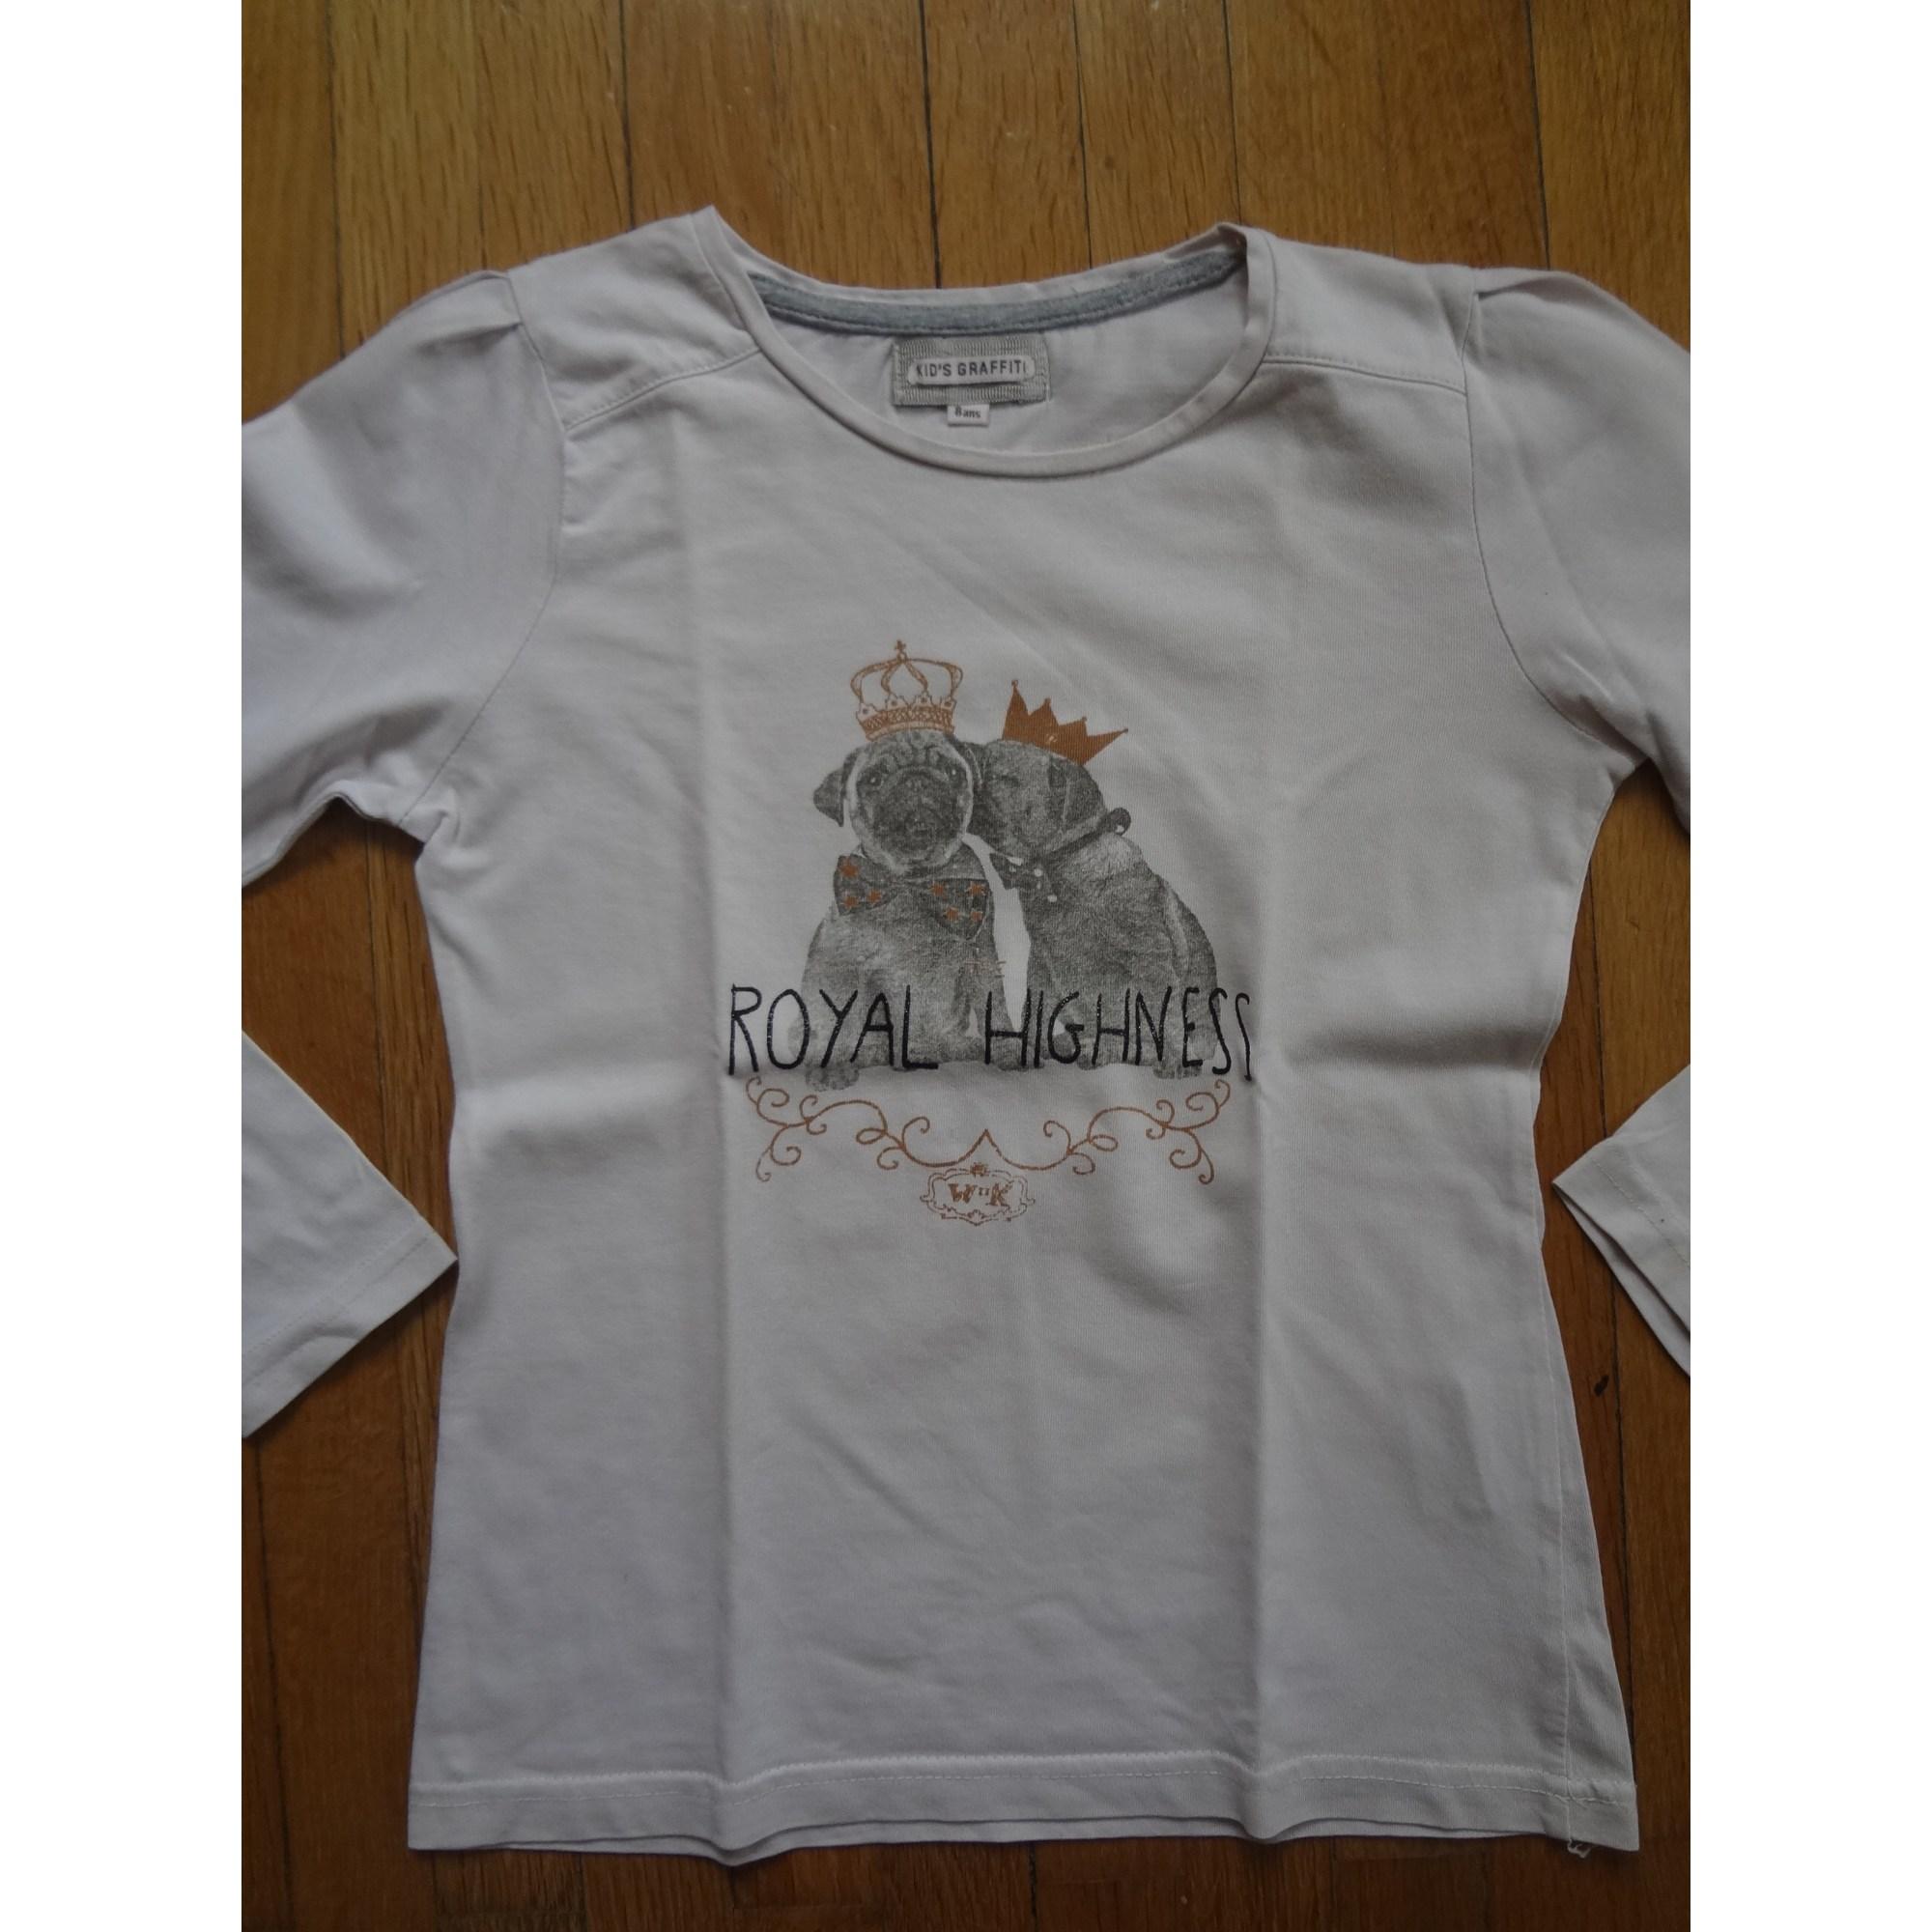 Top, Tee-shirt KID'S GRAFFITI Rose, fuschia, vieux rose